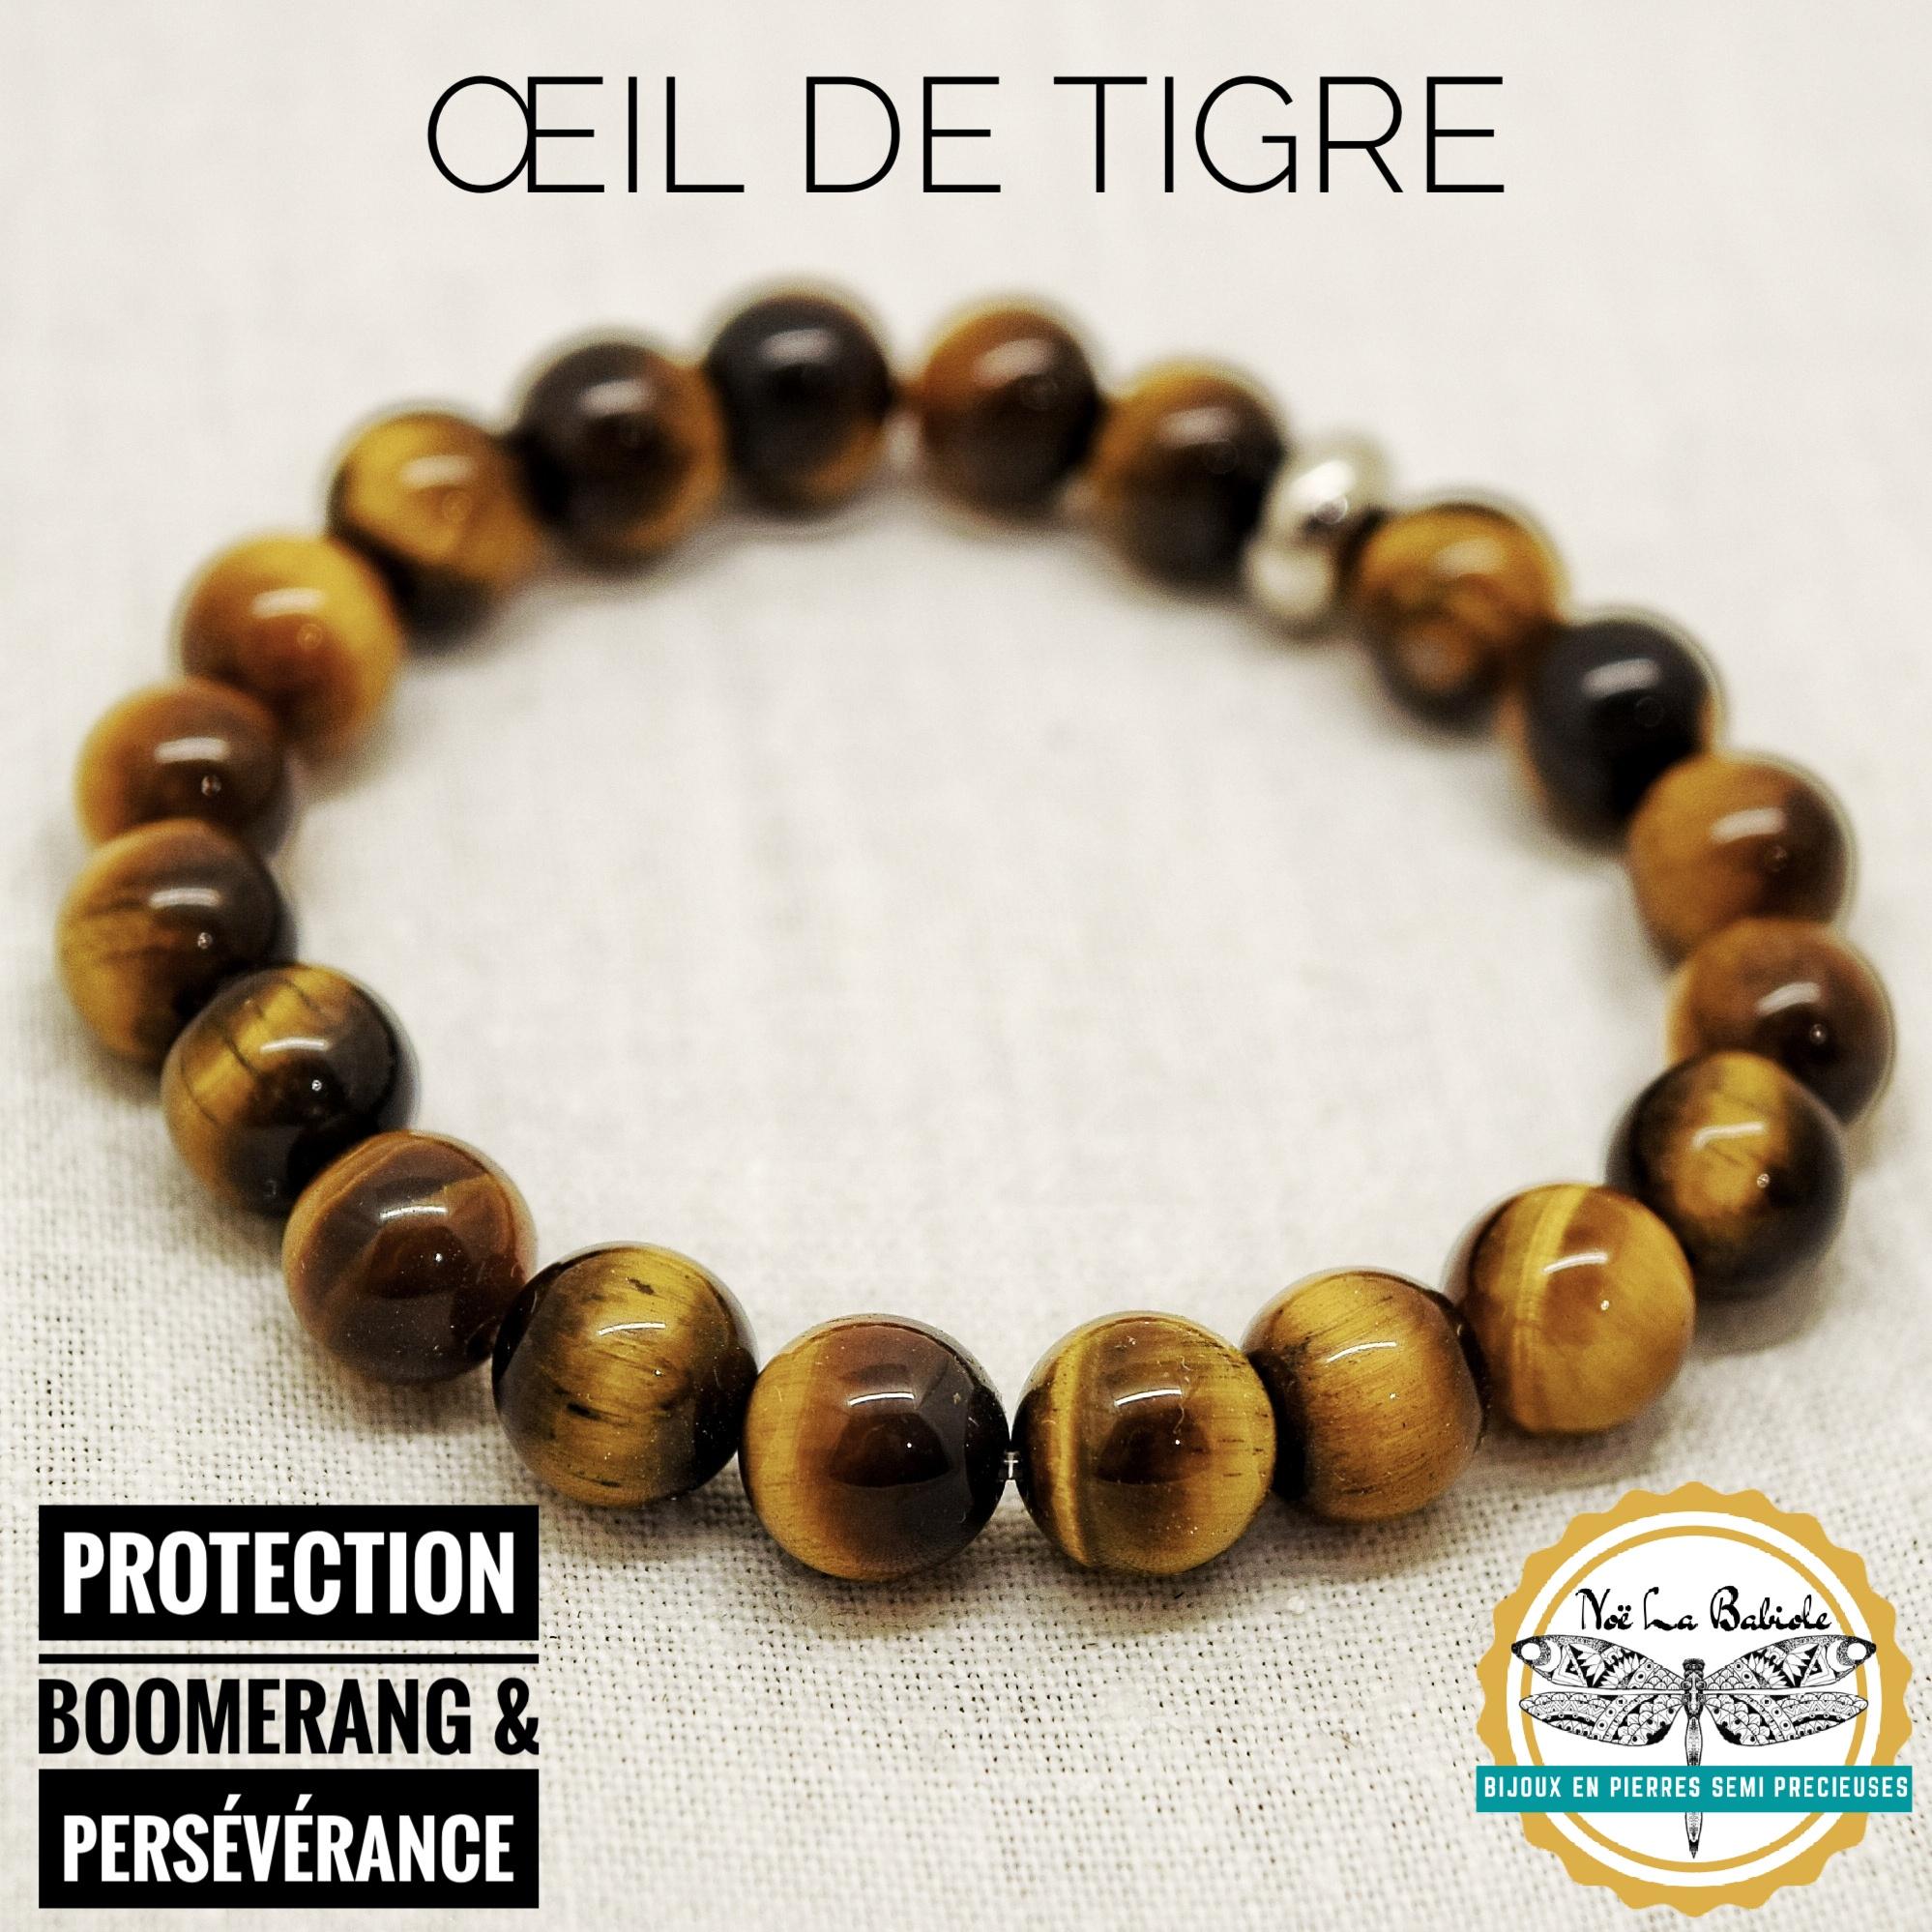 Bracelet Perséverence & Protection en Oeil de tigre